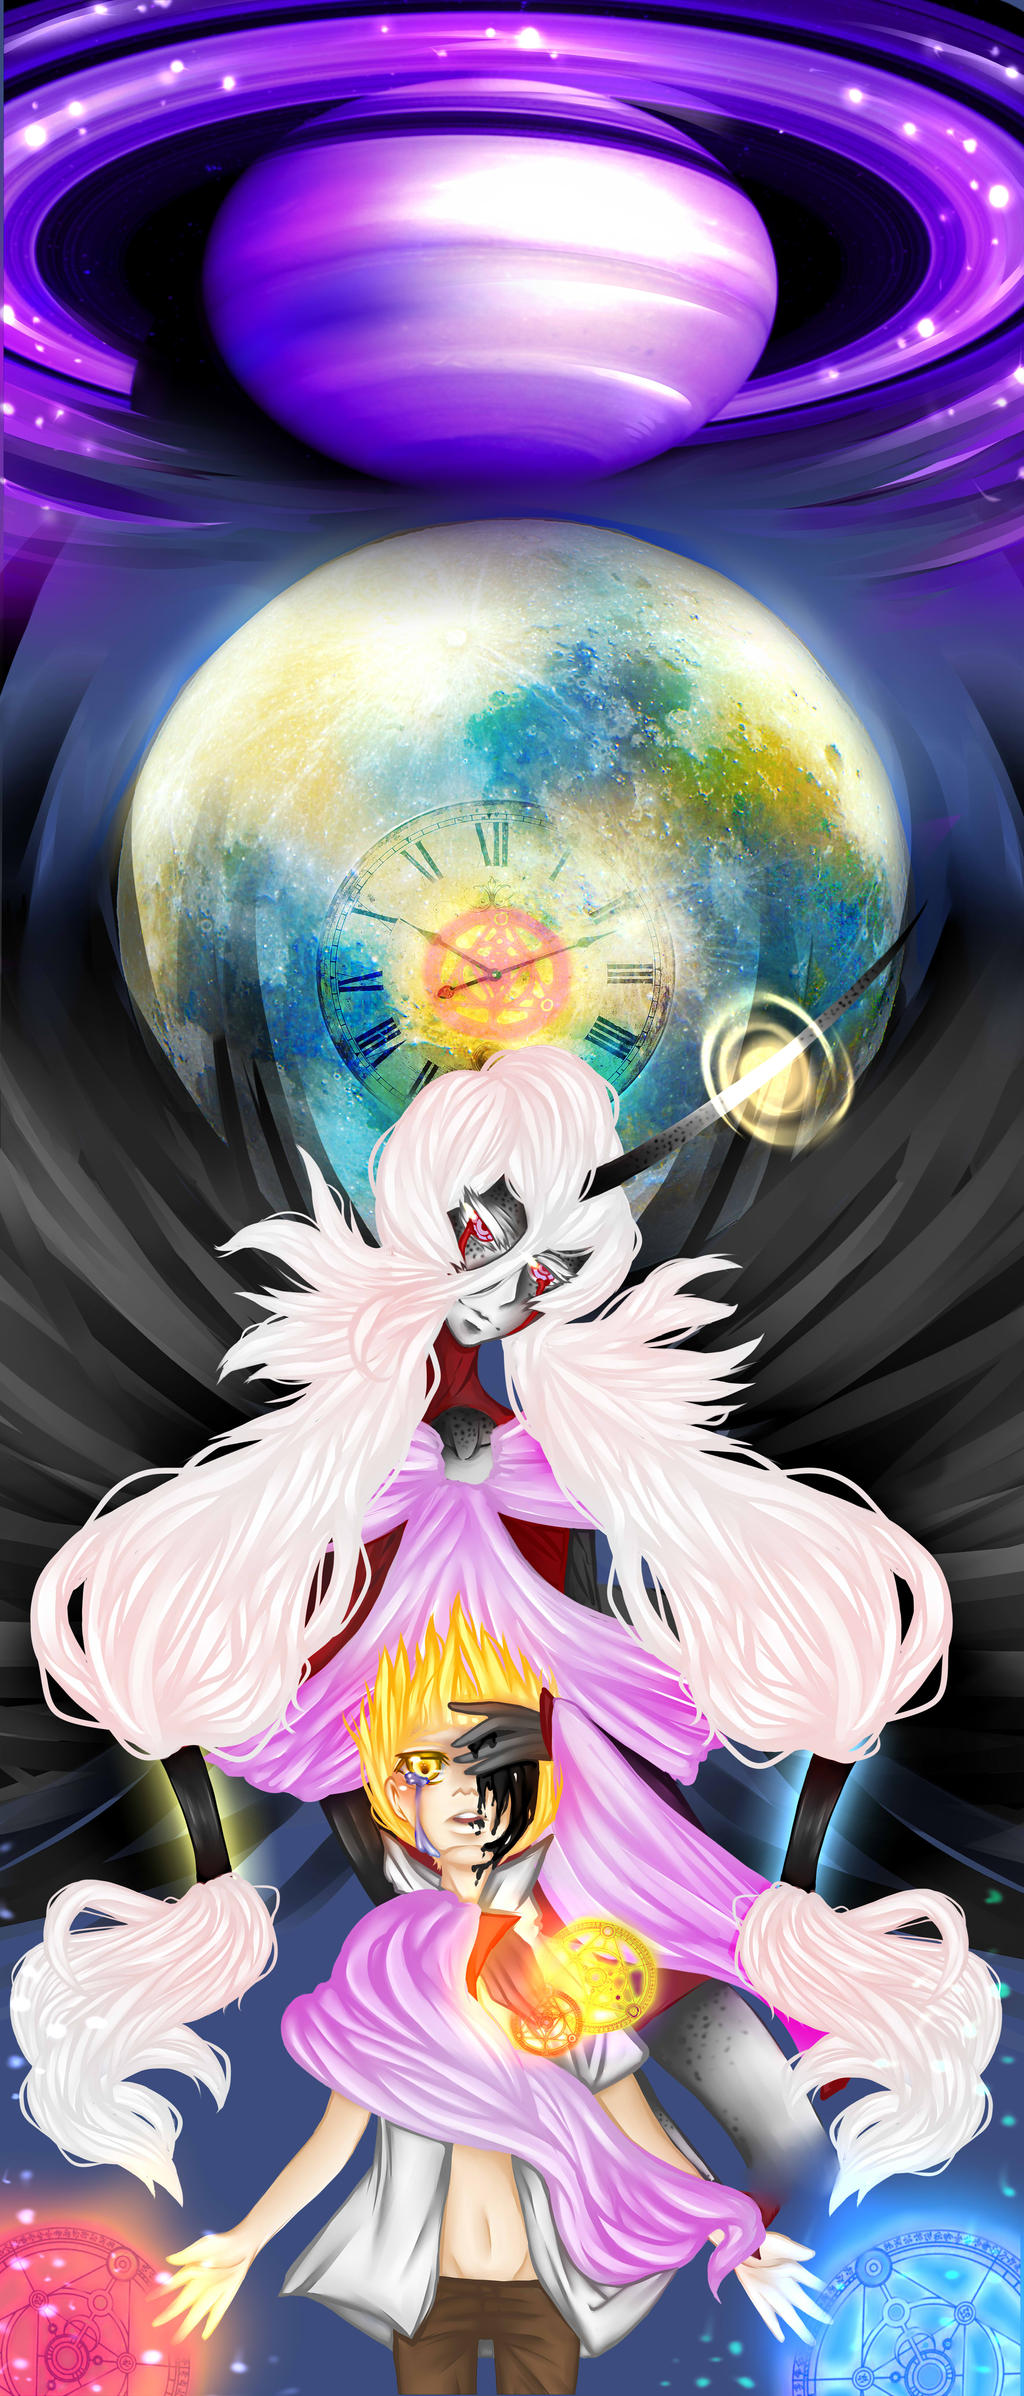 nowhere everywhere by RavenMomoka